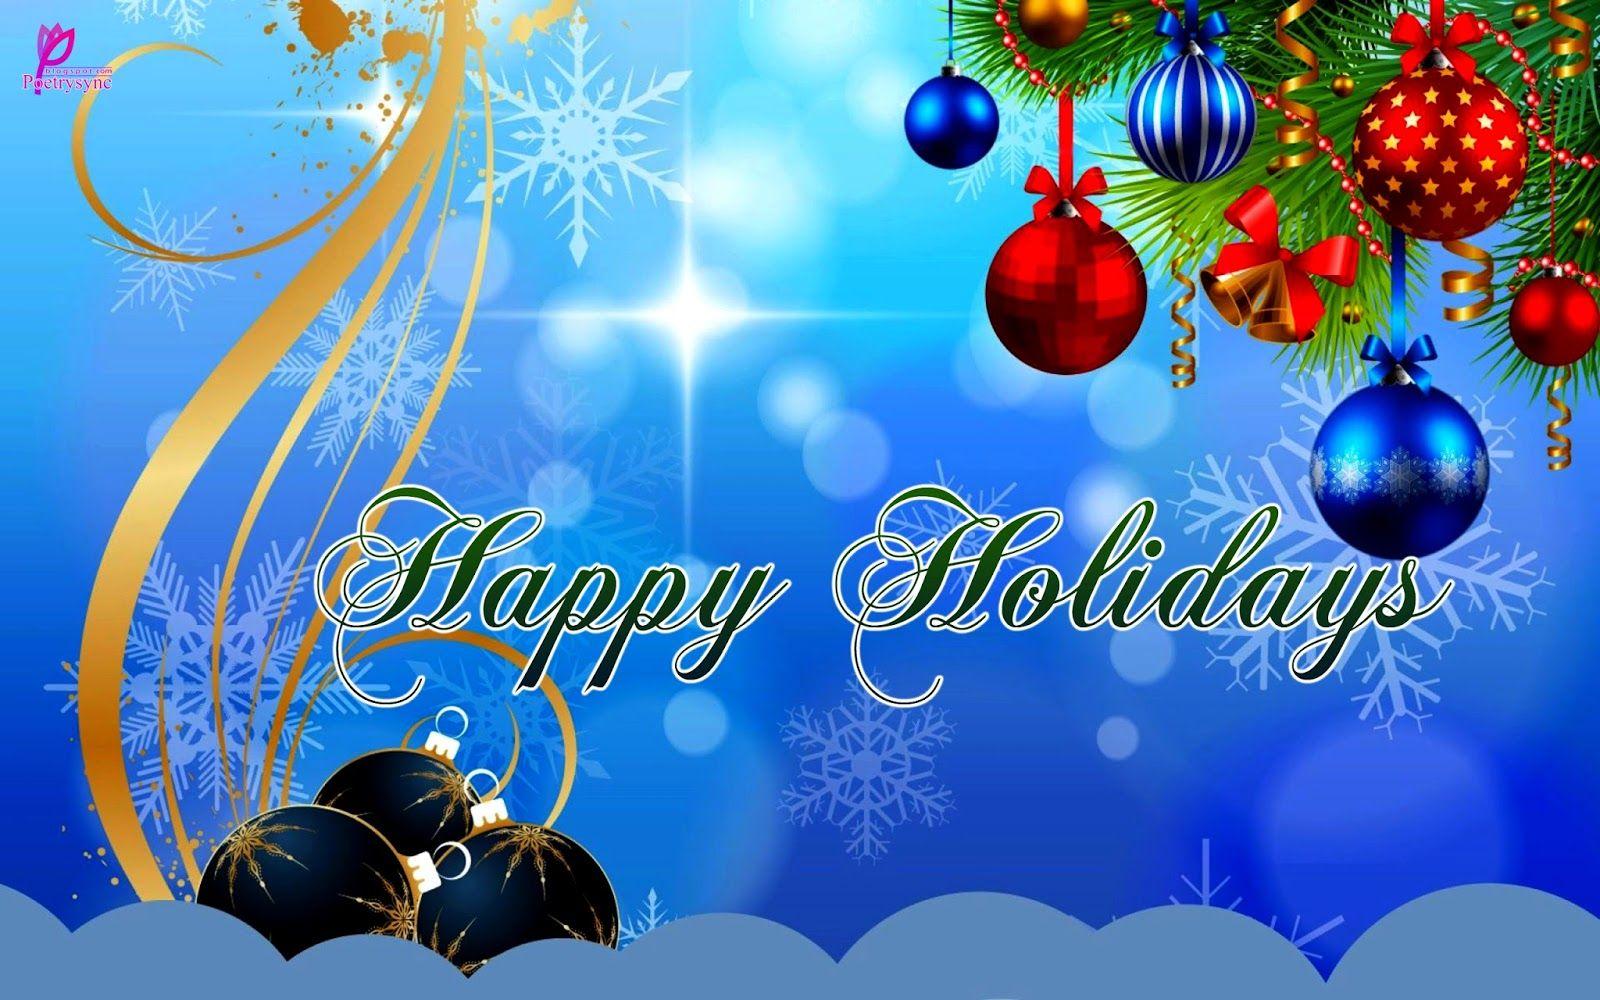 Happy Holidays Wallpapers PC 62898JJ WallpapersExpertcom 1600x1000